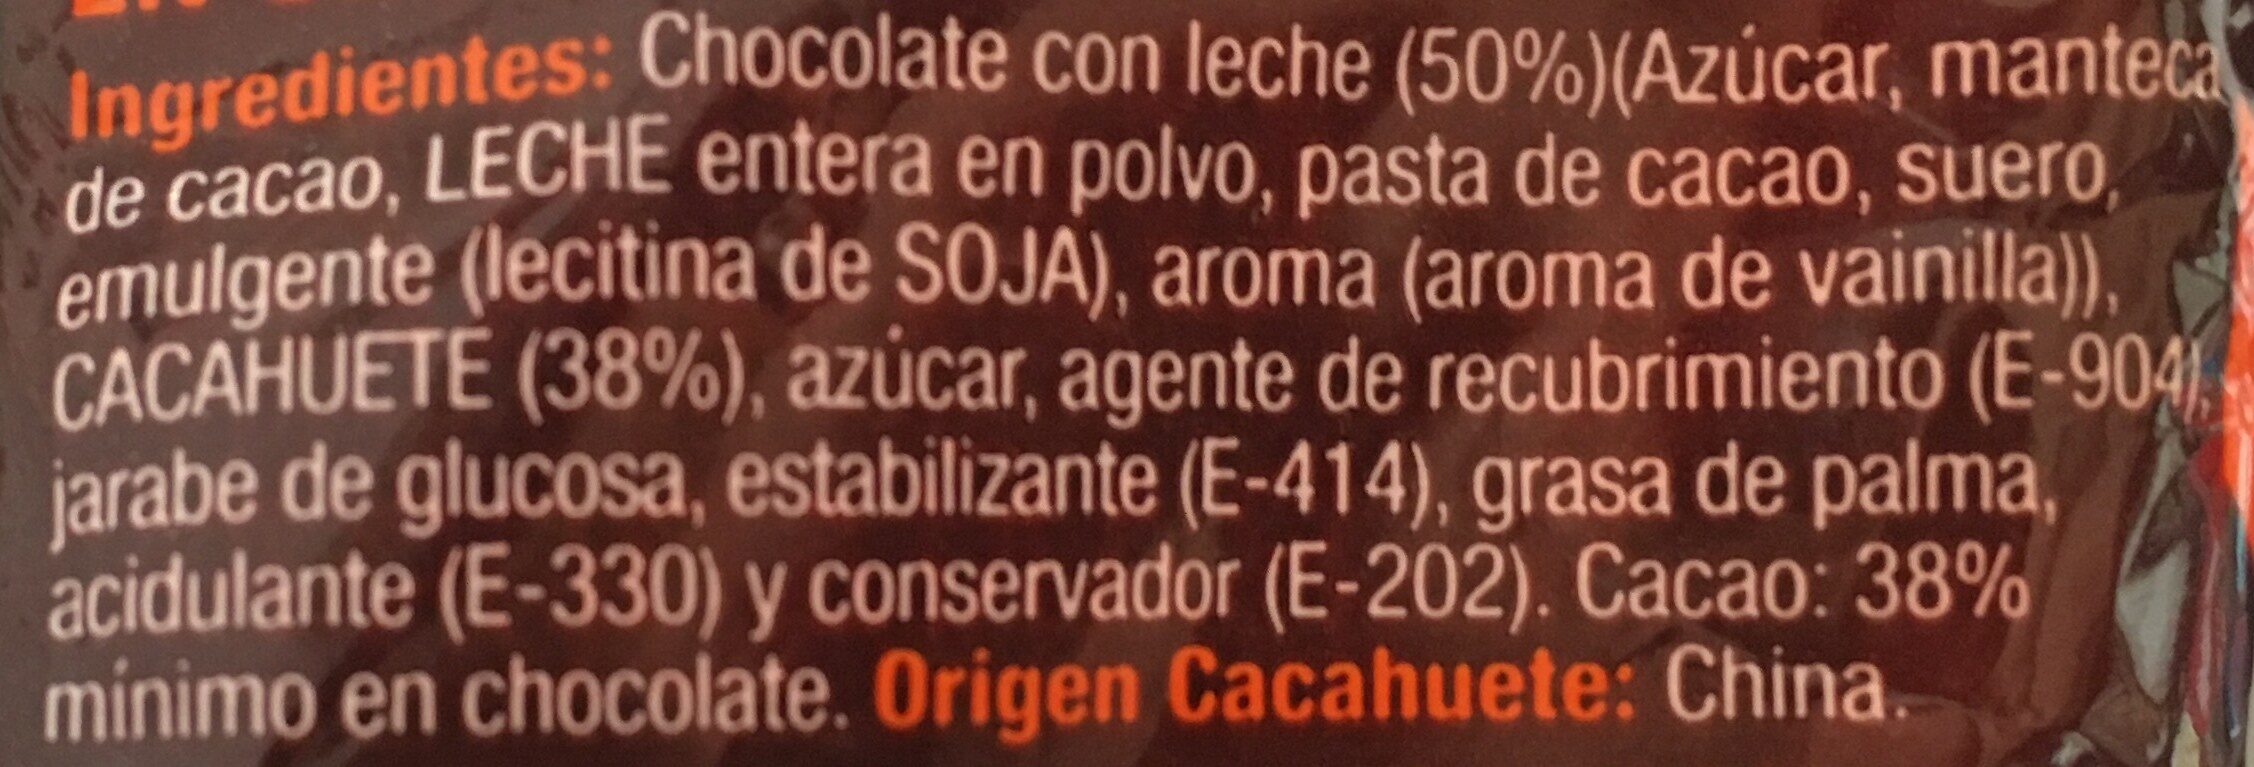 Cacahuetes bañados en chocolate con leche - Ingredients